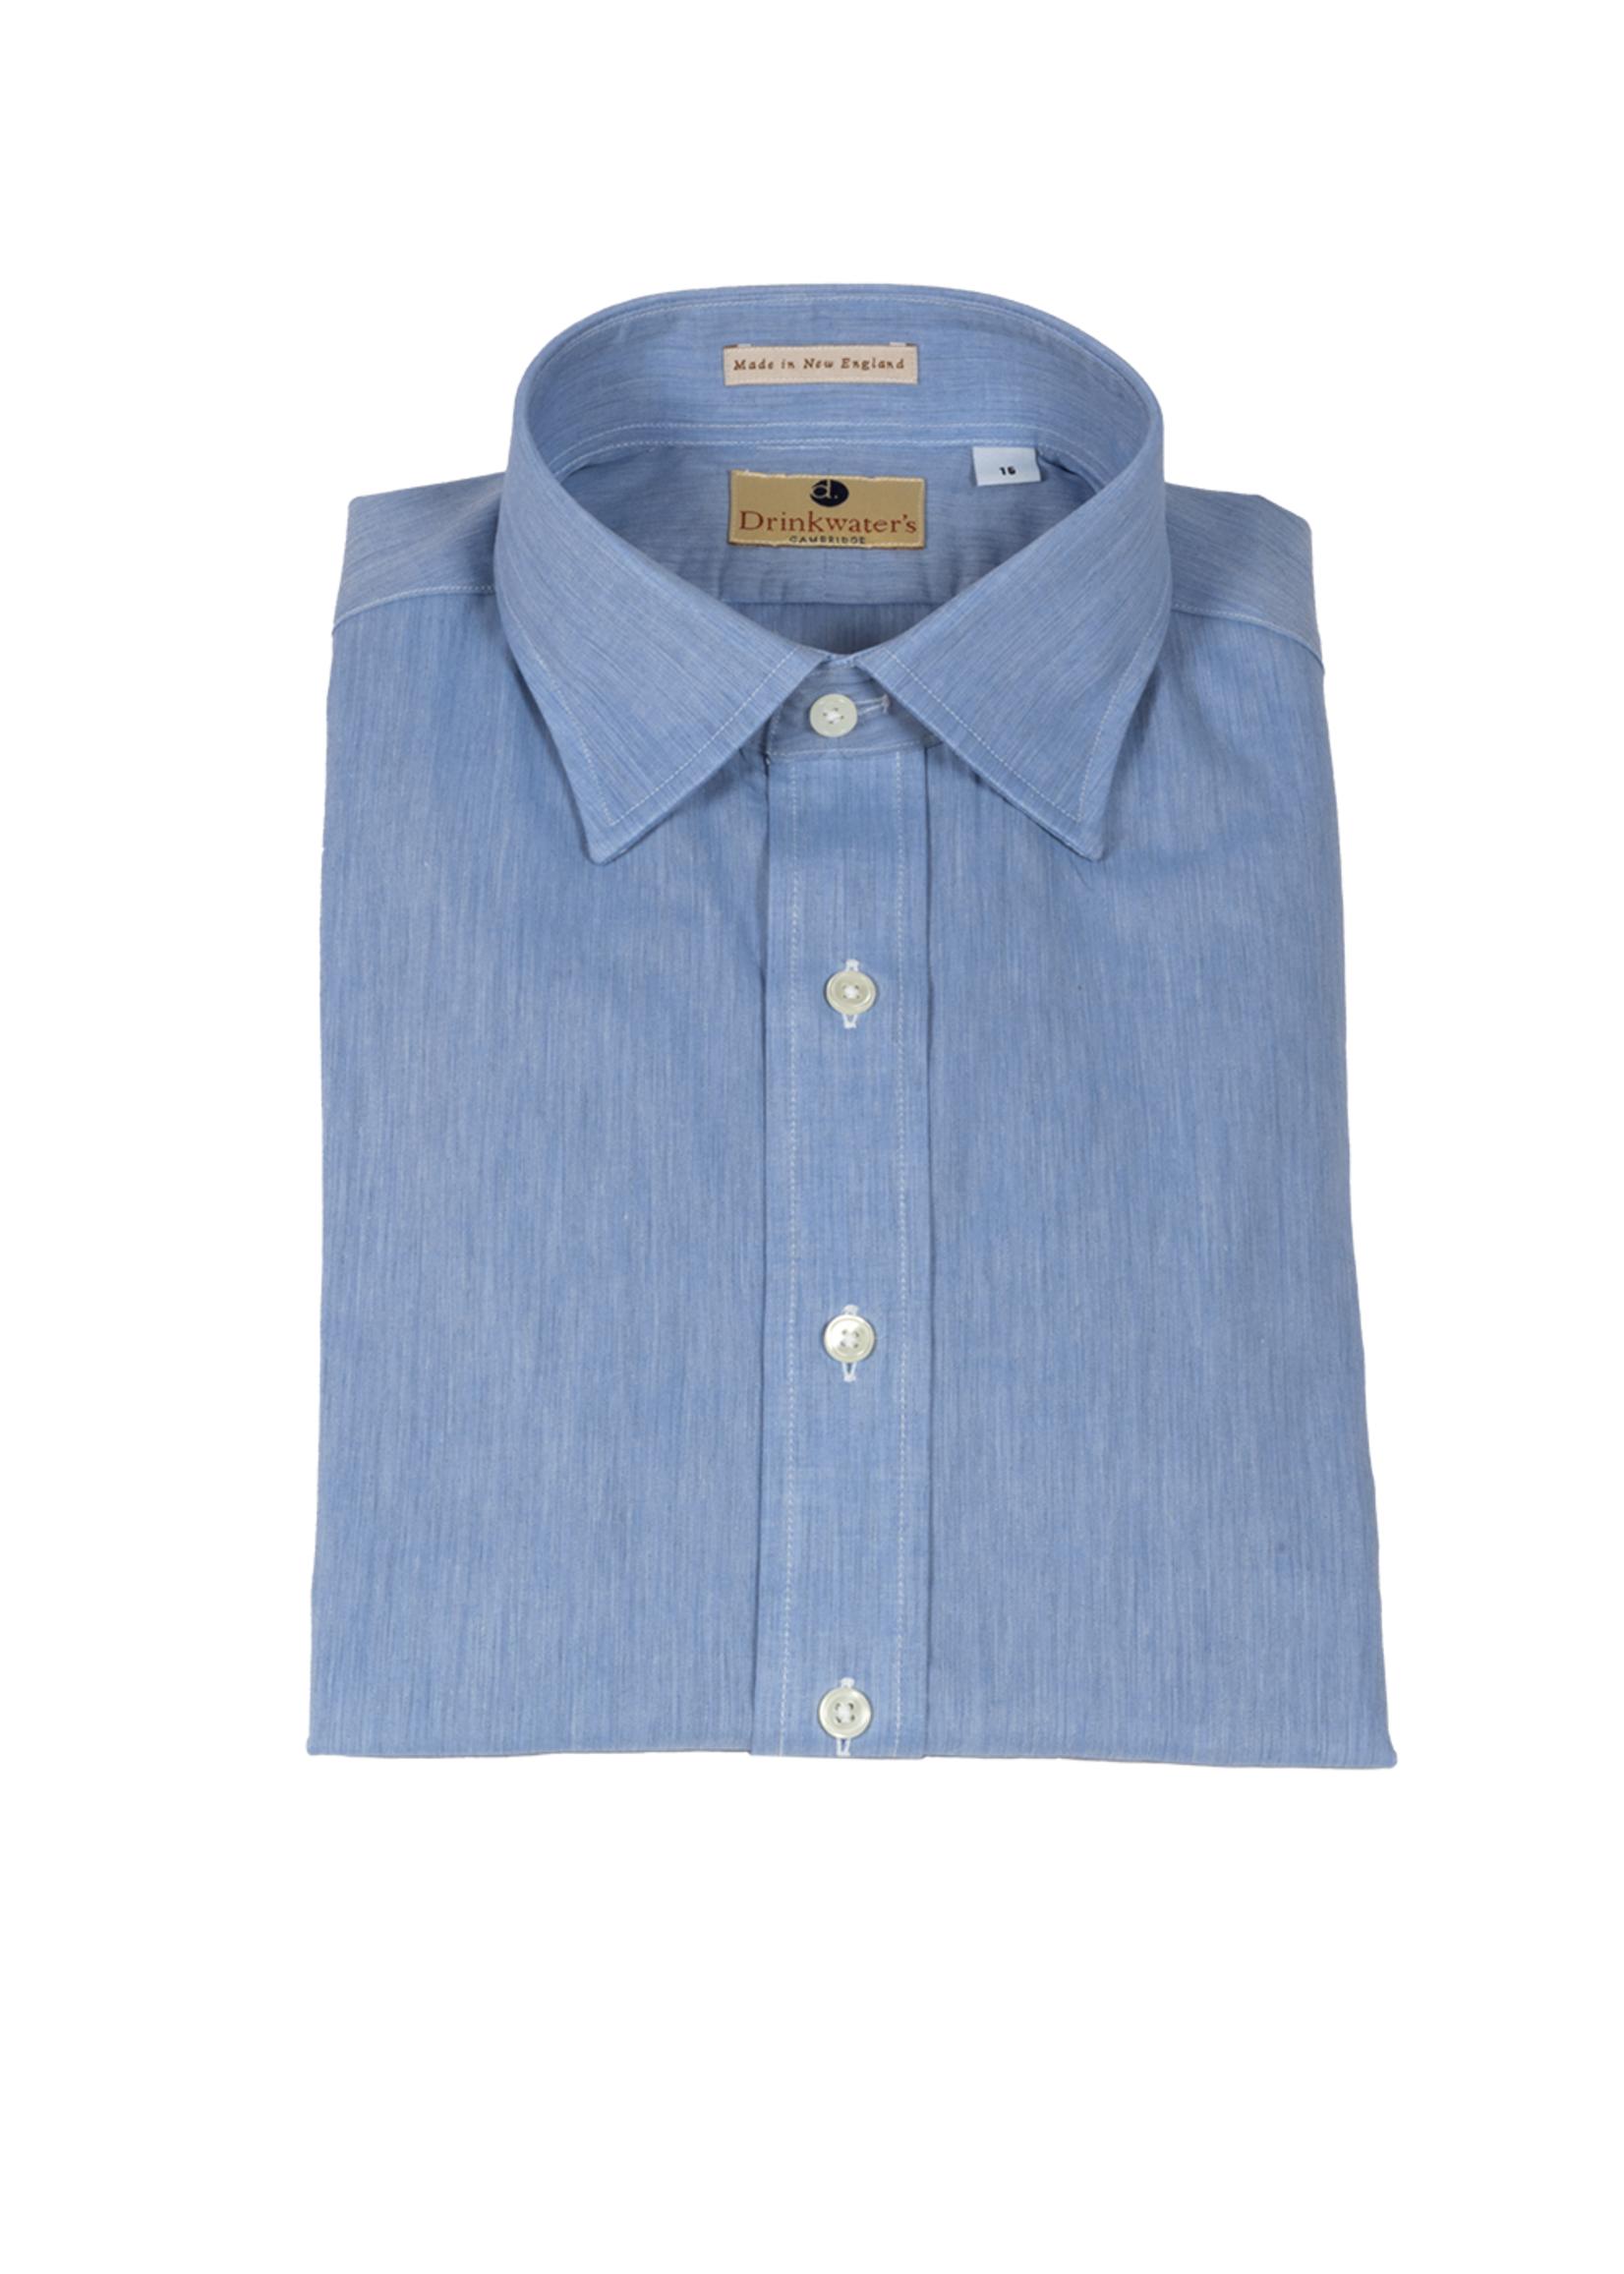 New England Shirt Co. Drinkwater's Light Blue Chambray Dress Shirt